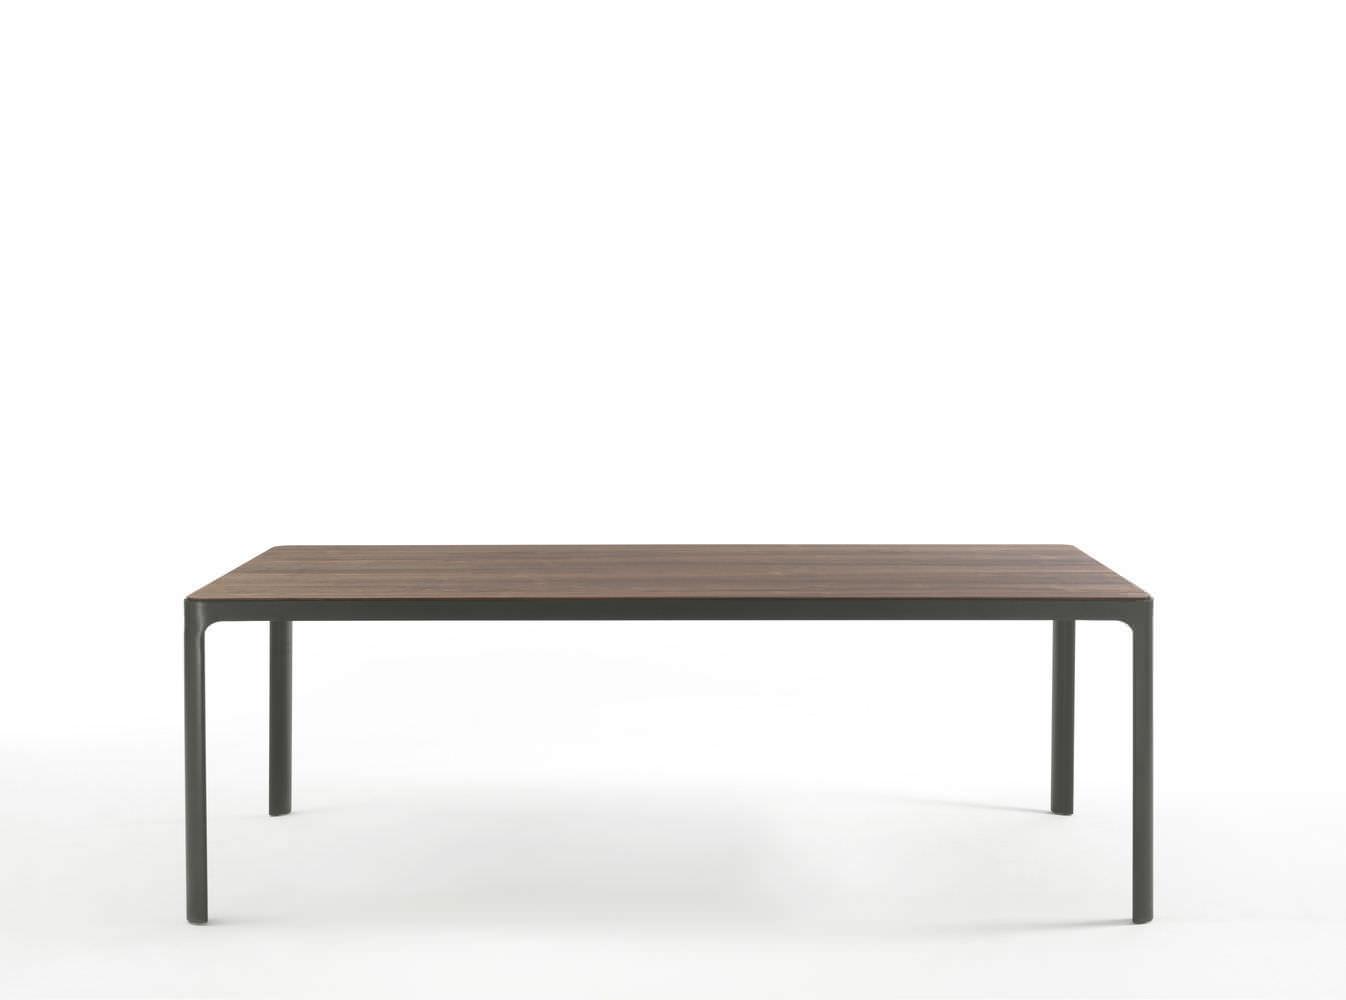 Moderner Tisch / Holz / Lackiertes Metall / Rechteckig   HUG By Alessandro  Bonato